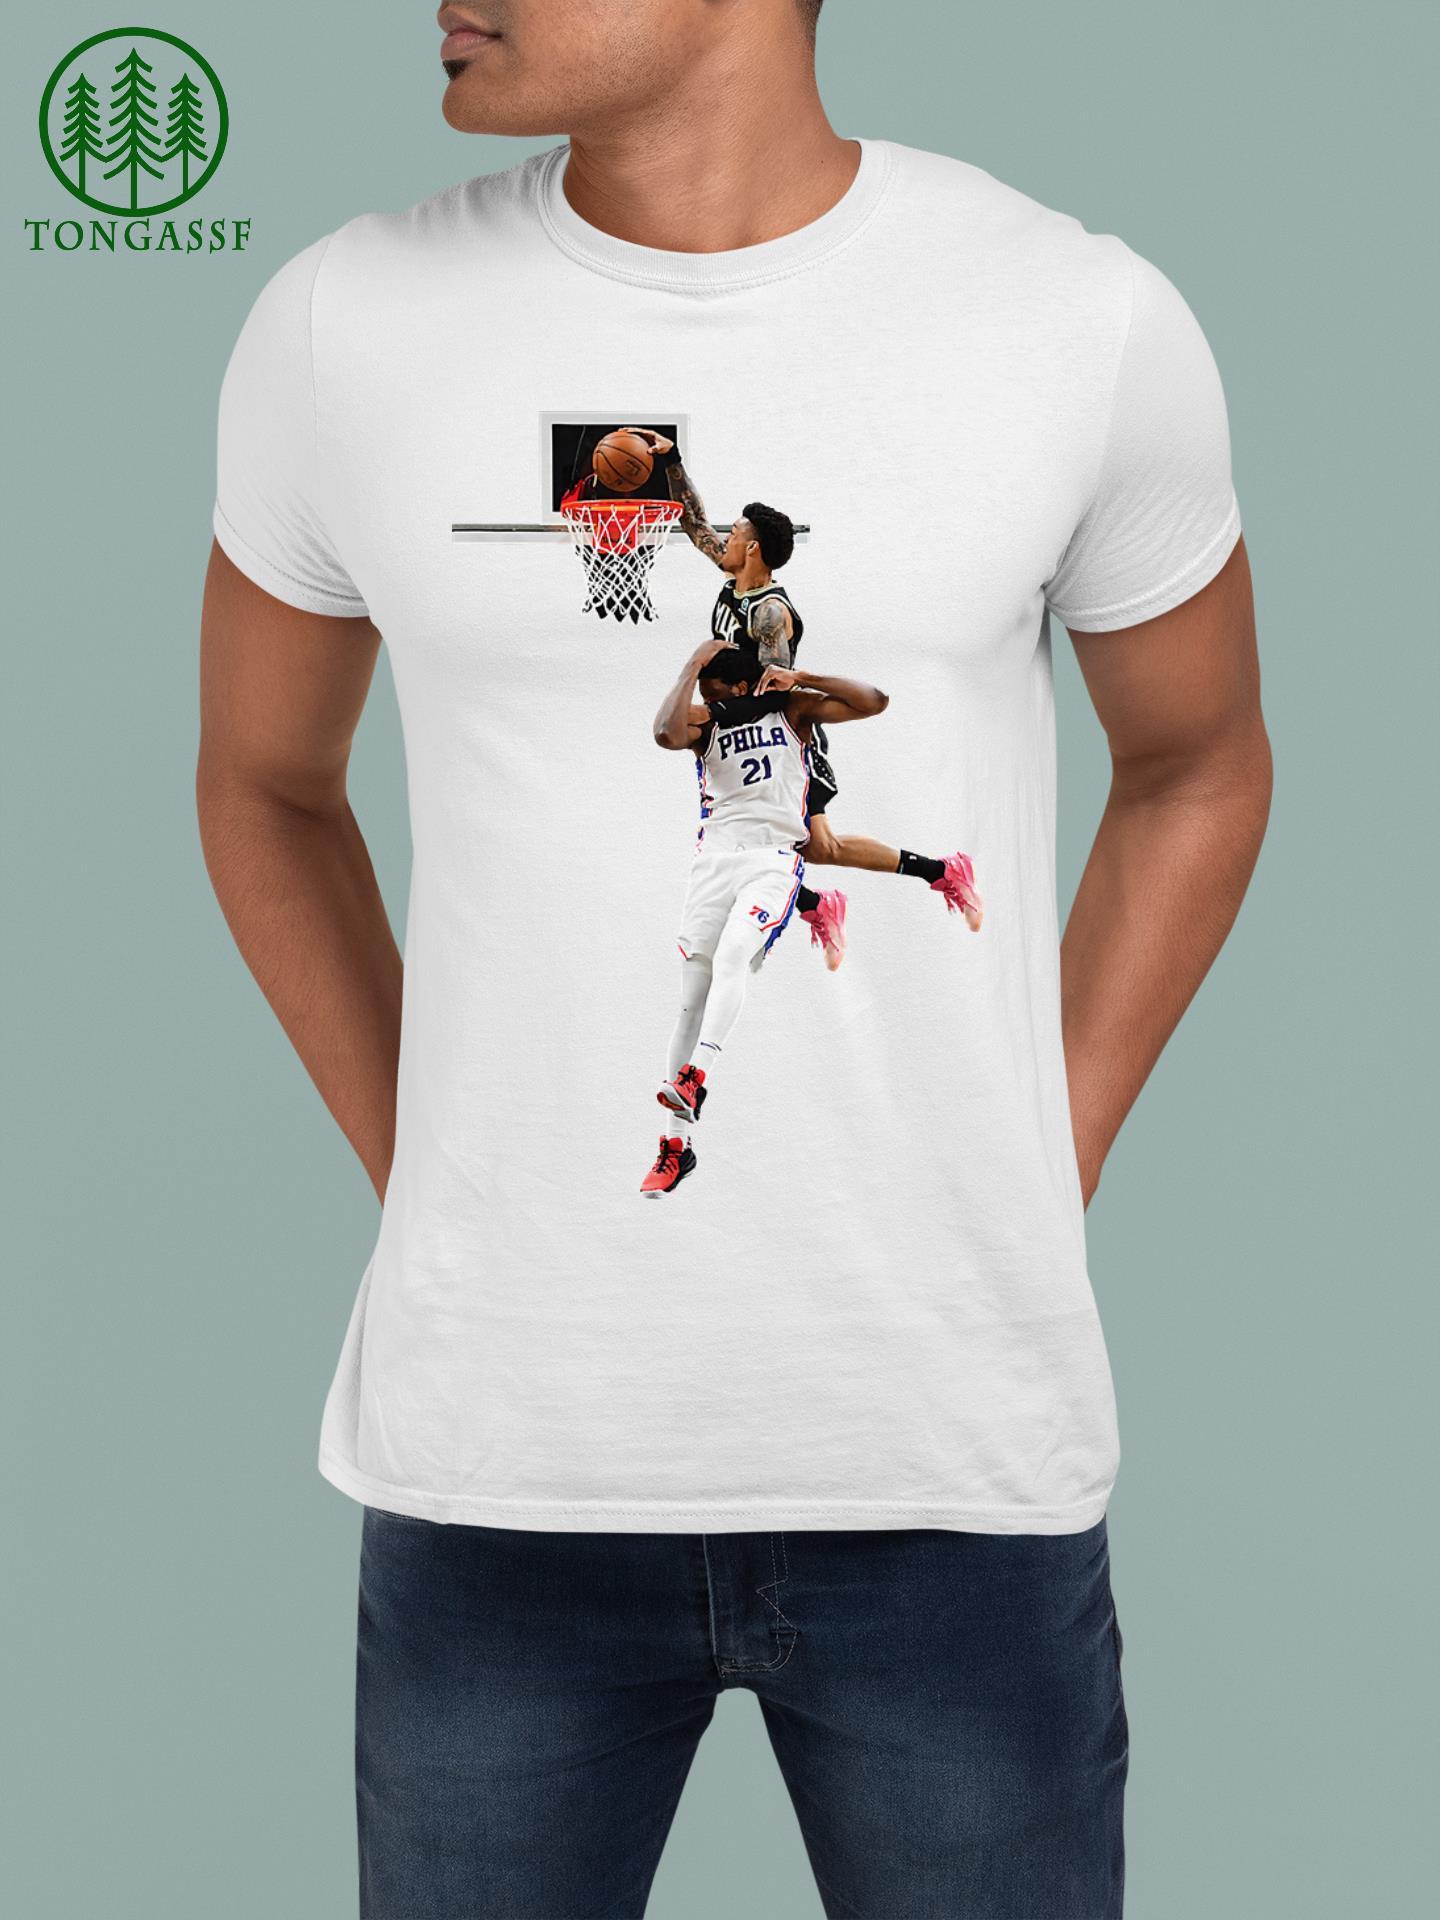 John Collins Joel Embiid NBA basketballShirt